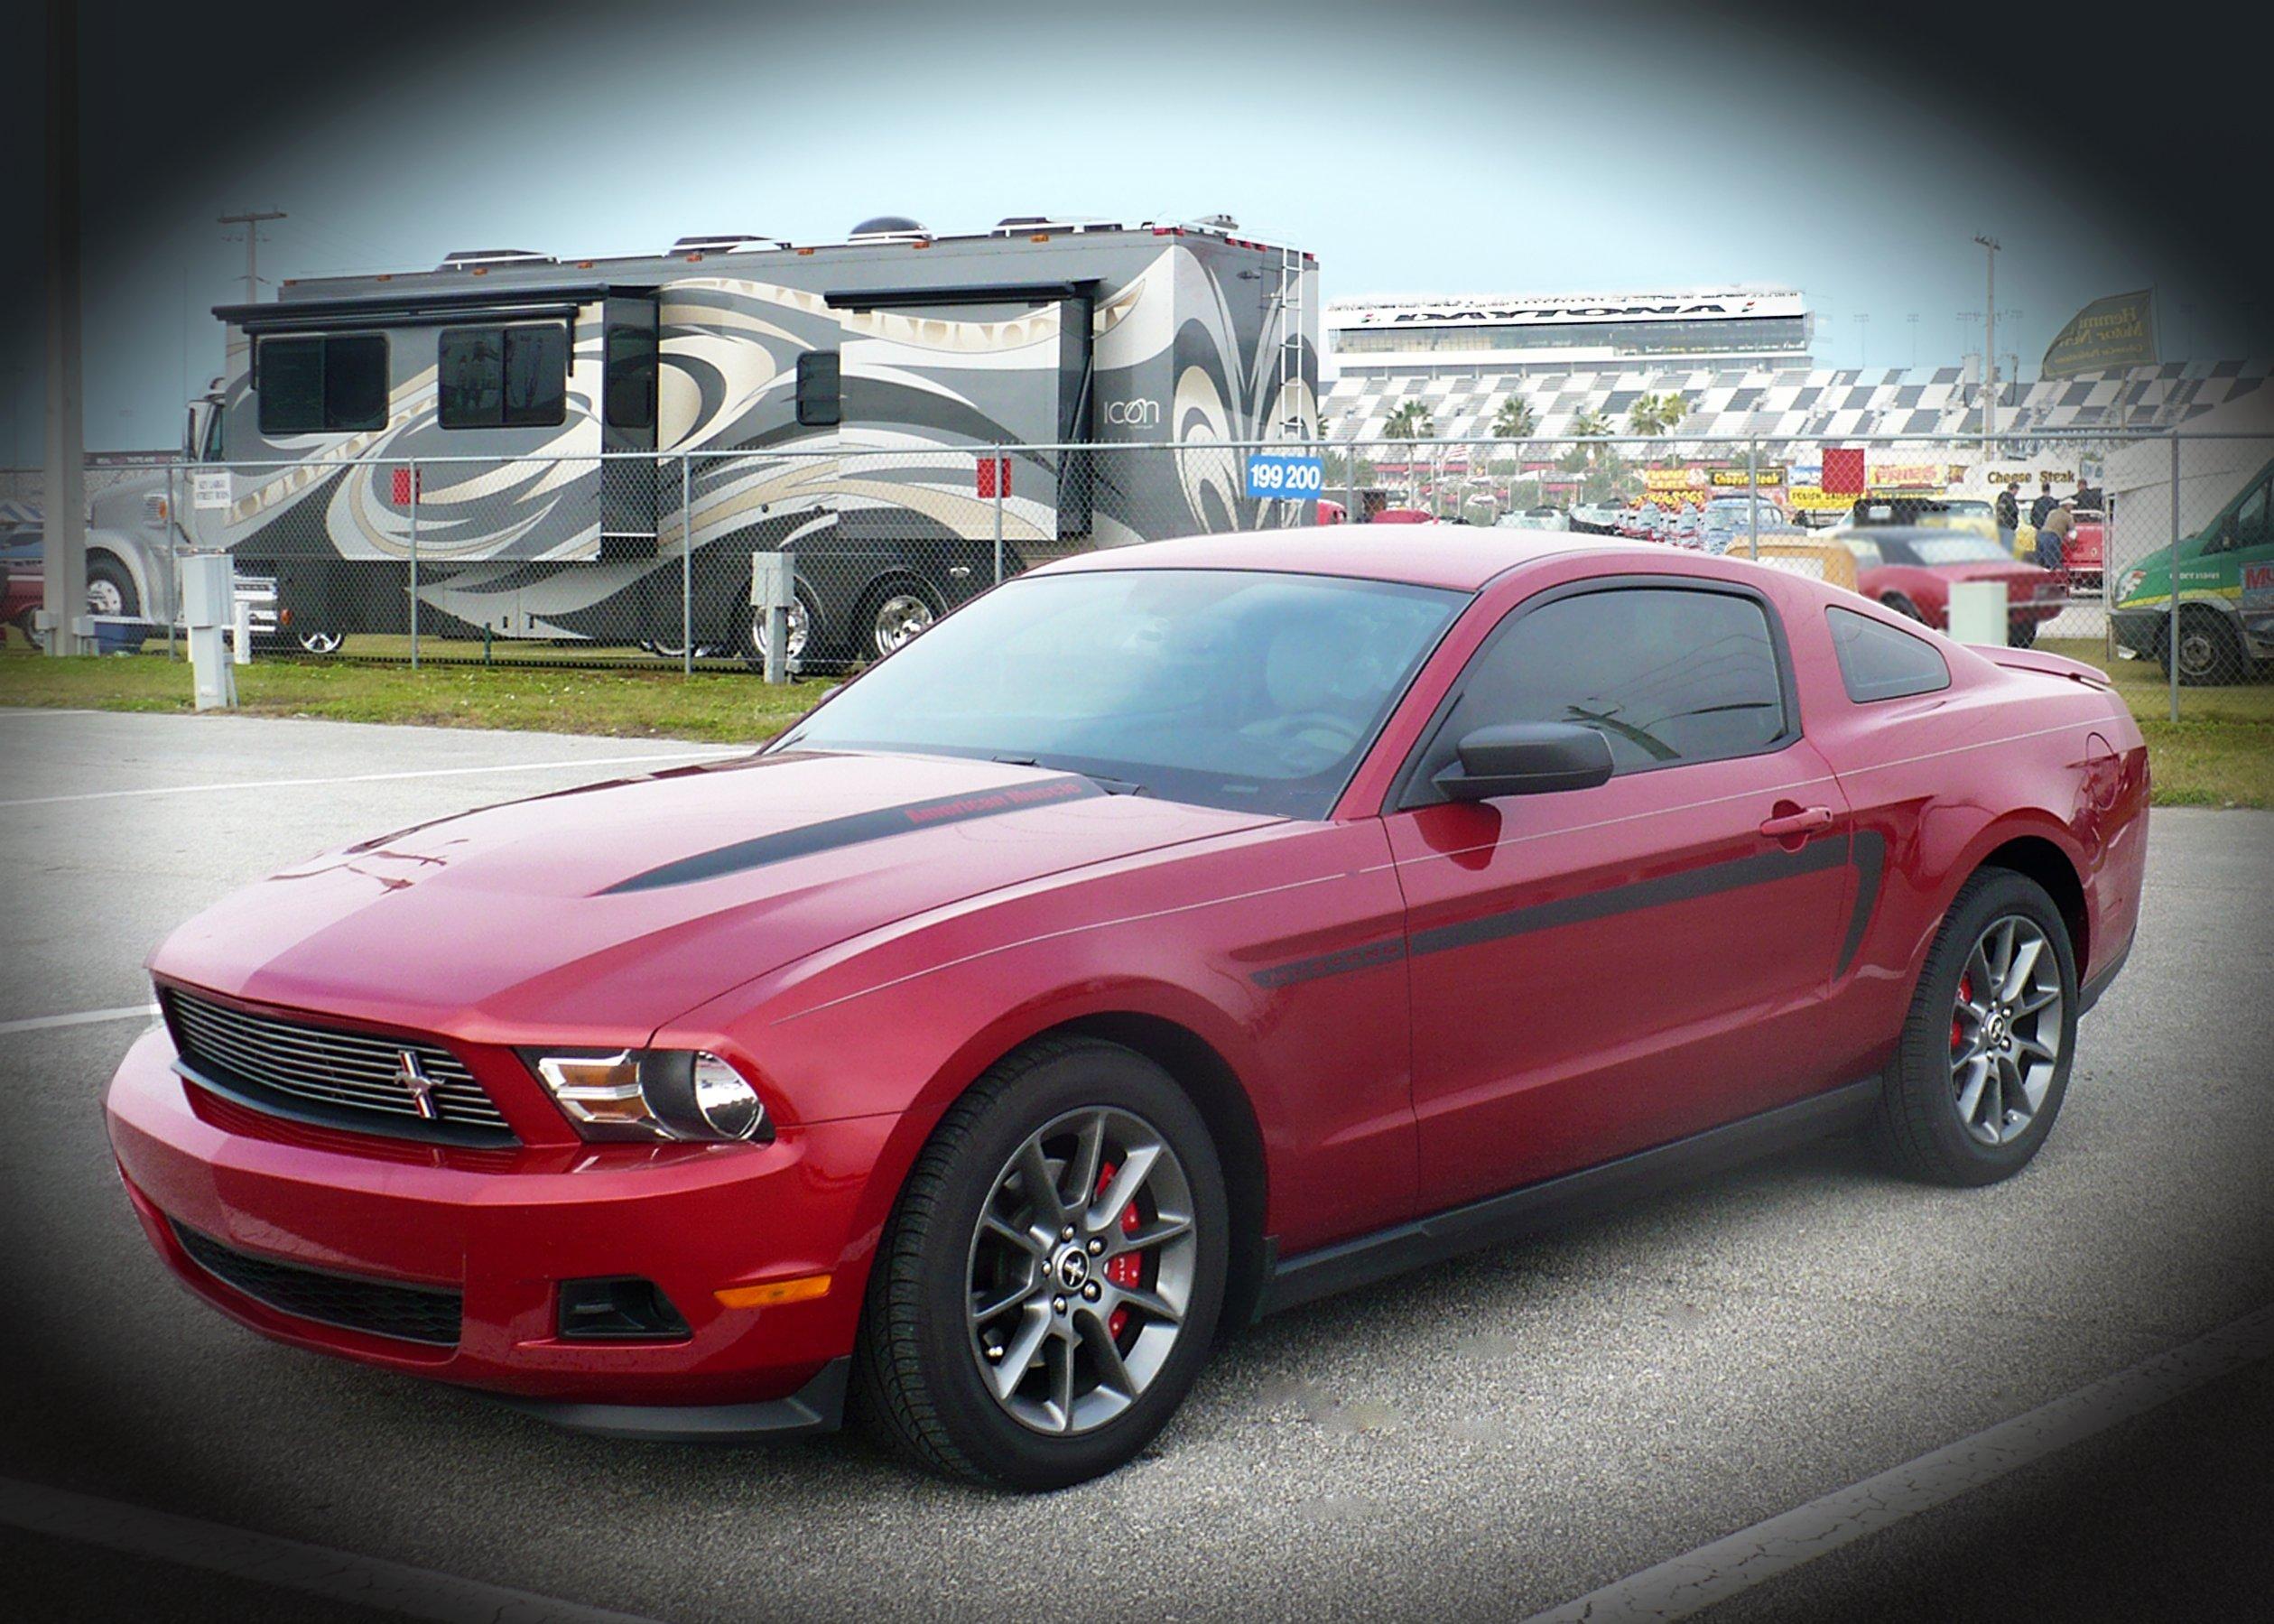 Click image for larger version  Name:Daytona Mustang.jpg Views:41 Size:641.3 KB ID:199419